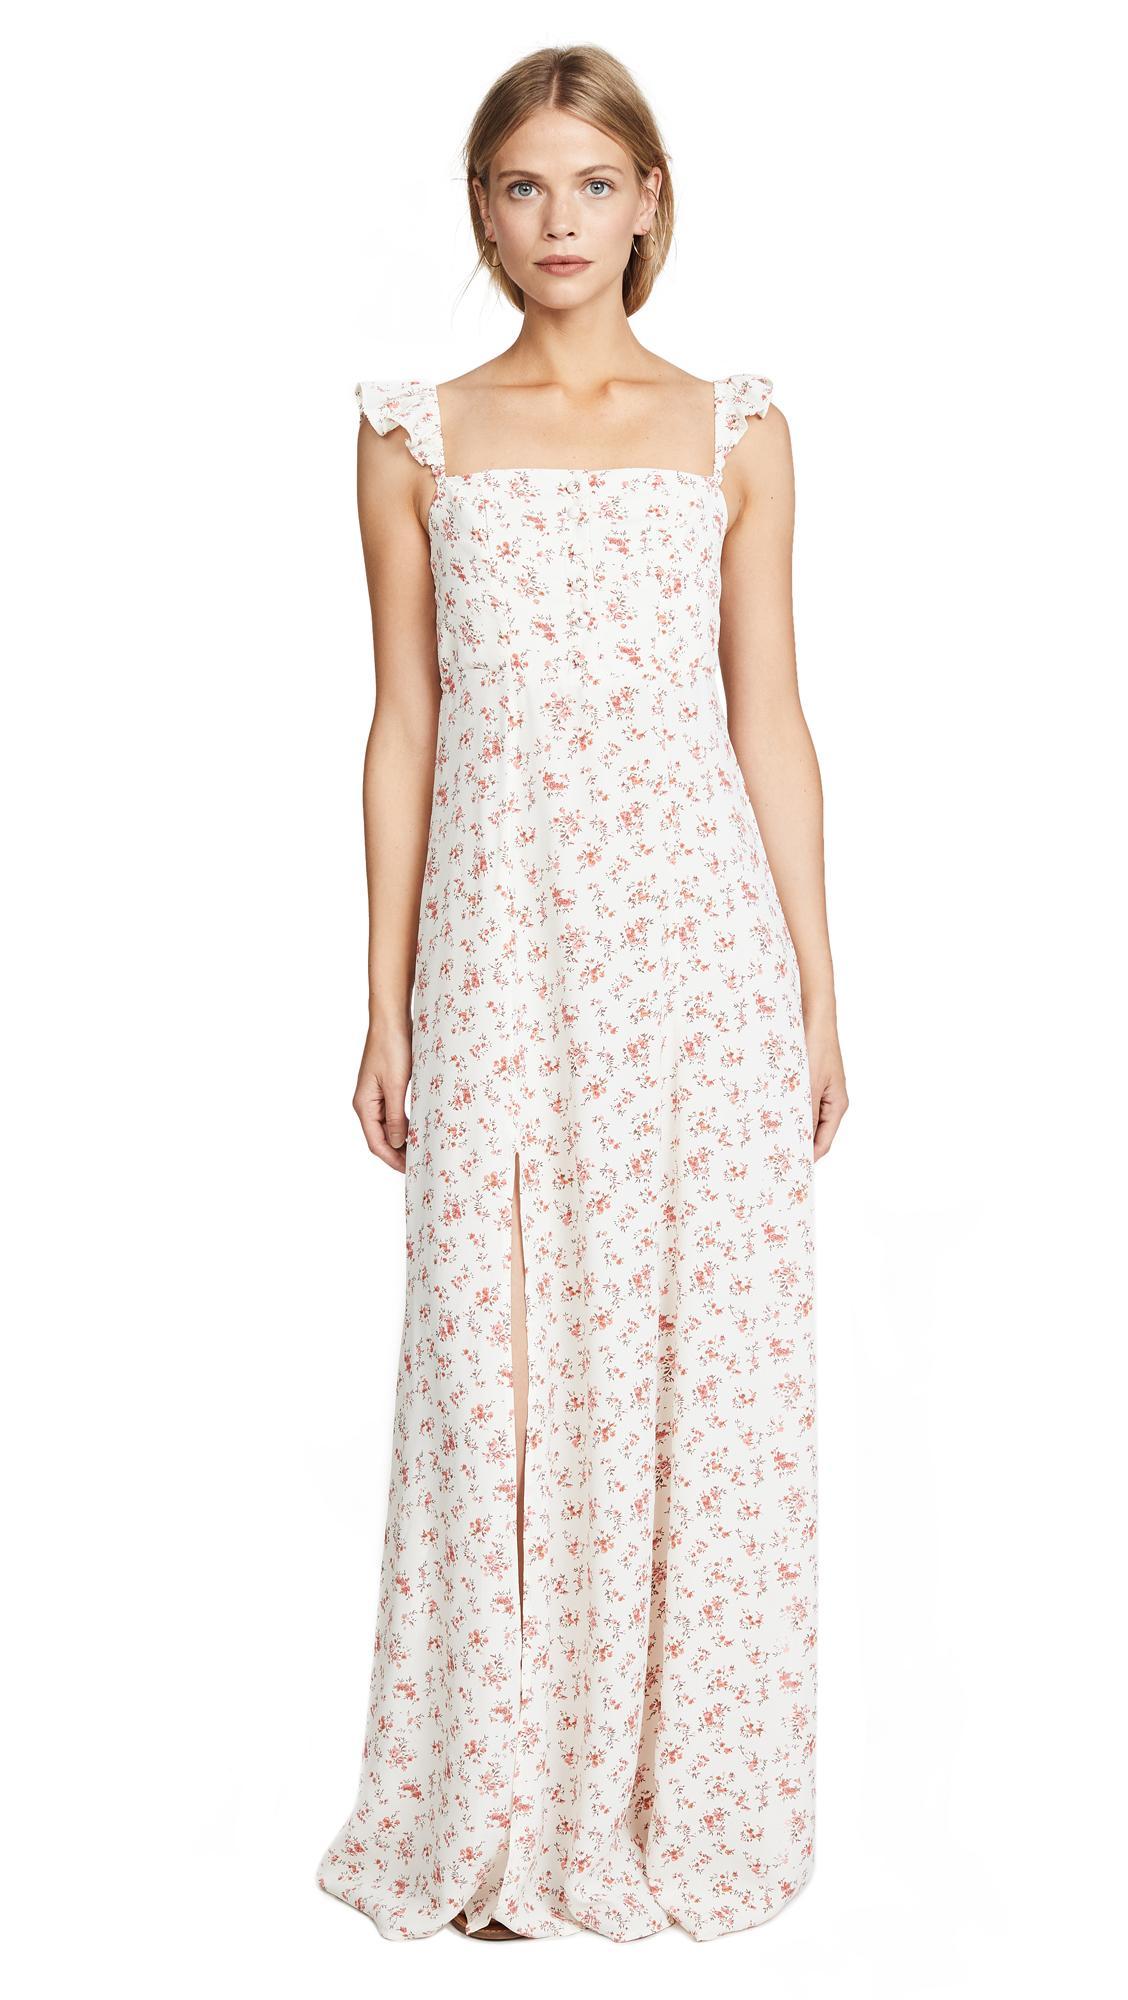 fae7b69f499 Flynn Skye Bardot Maxi Dress In Country Side Blooms